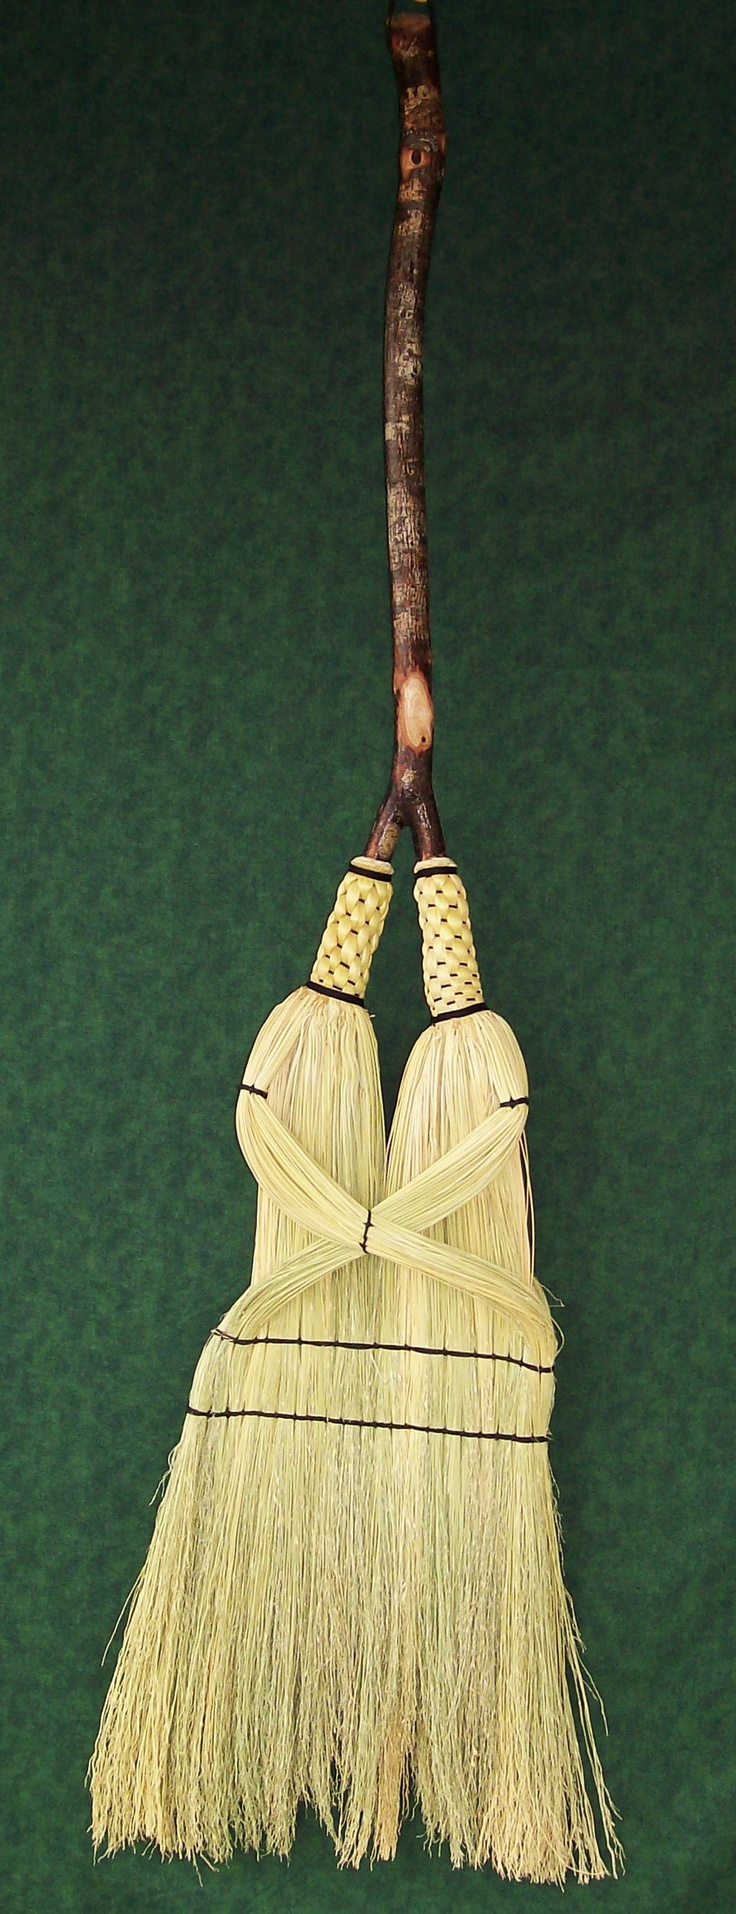 wedding brooms wedding brooms handmade double wedding broom with embracing arms